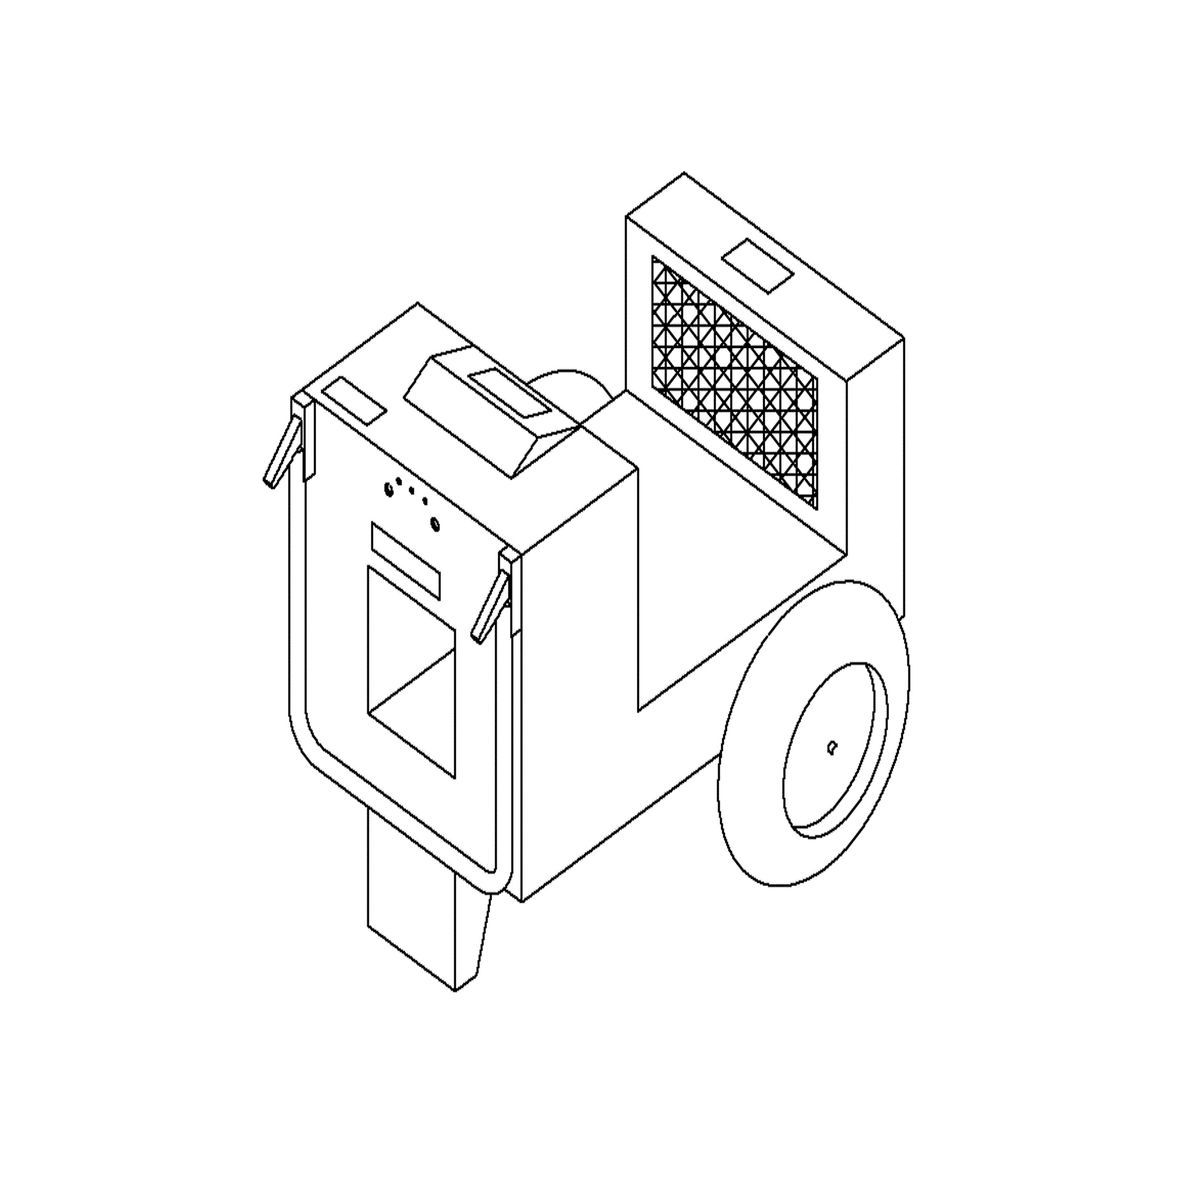 hpp5 low pressure hydraulic tools tools dies accessories Drain Power Drain Opener bur pphid 264554 hpp18 bur hpp5 lineart